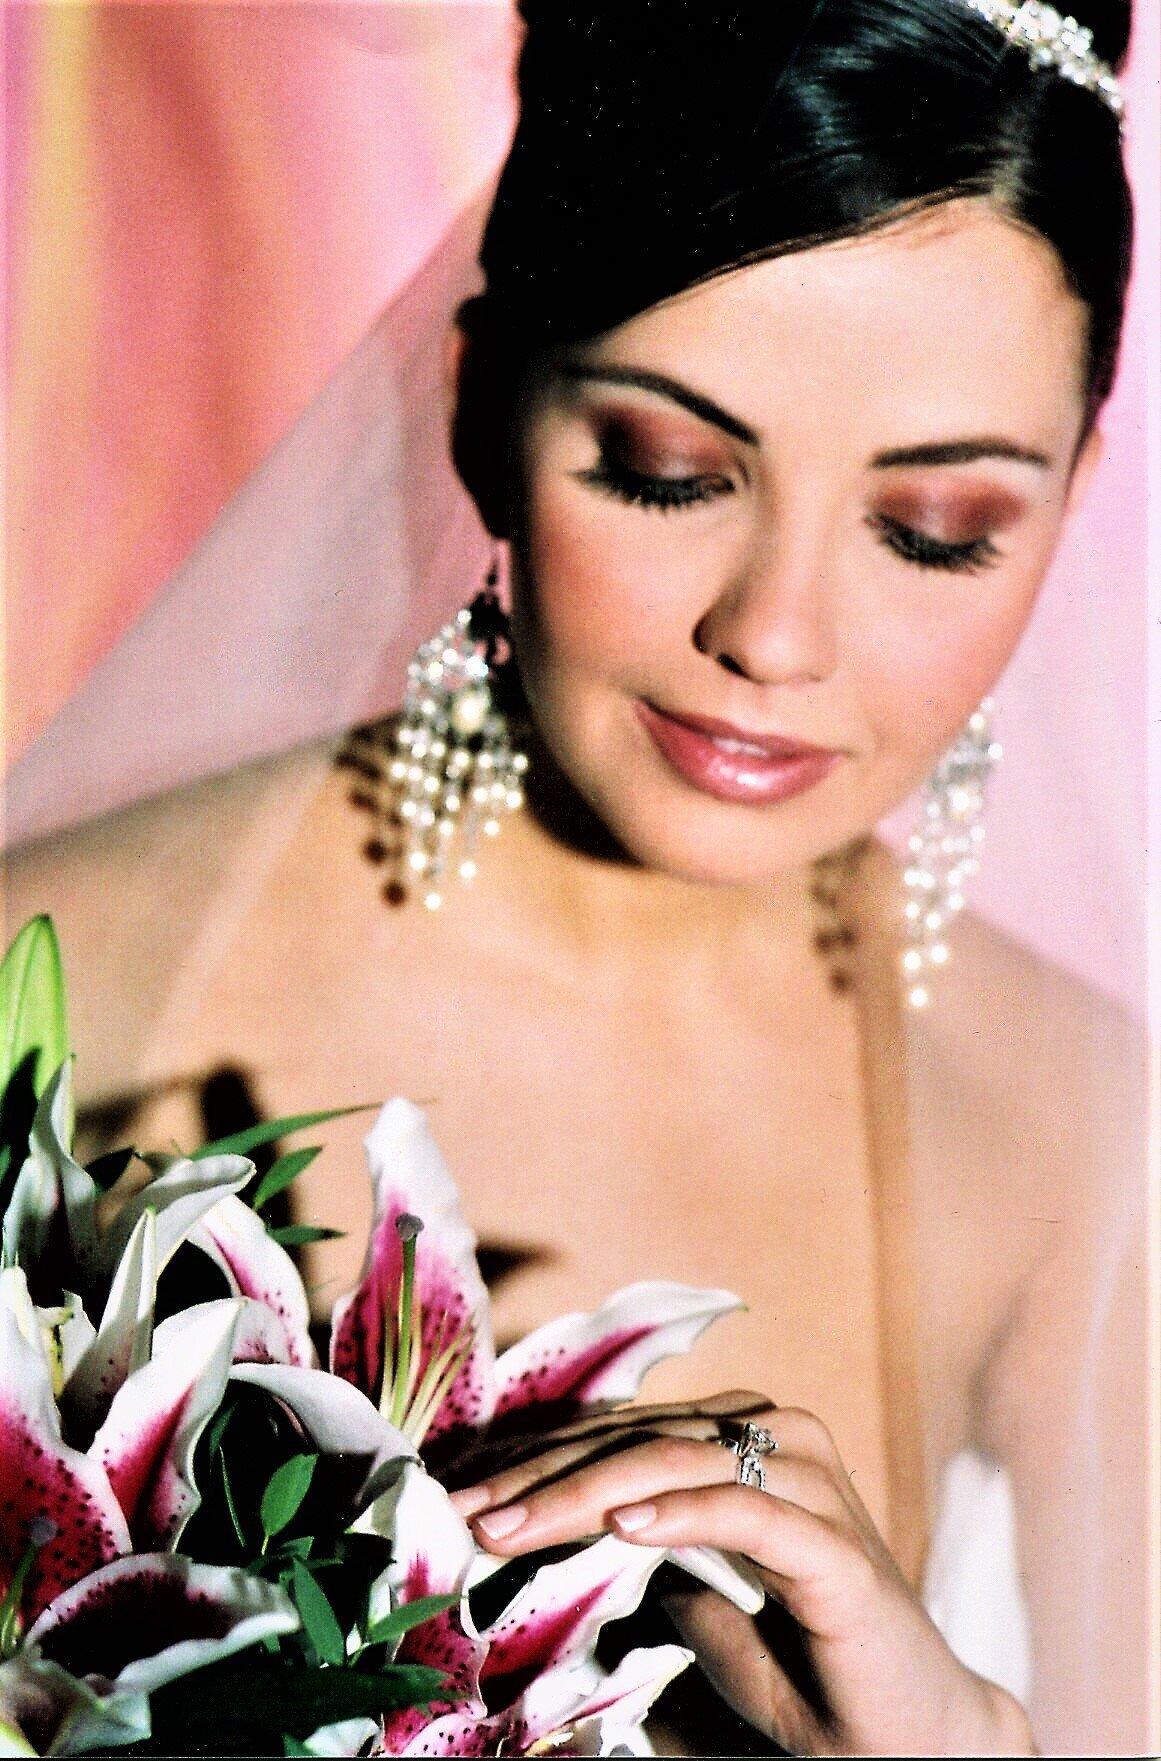 BEAUTIFUL BRIDE TAYLOR